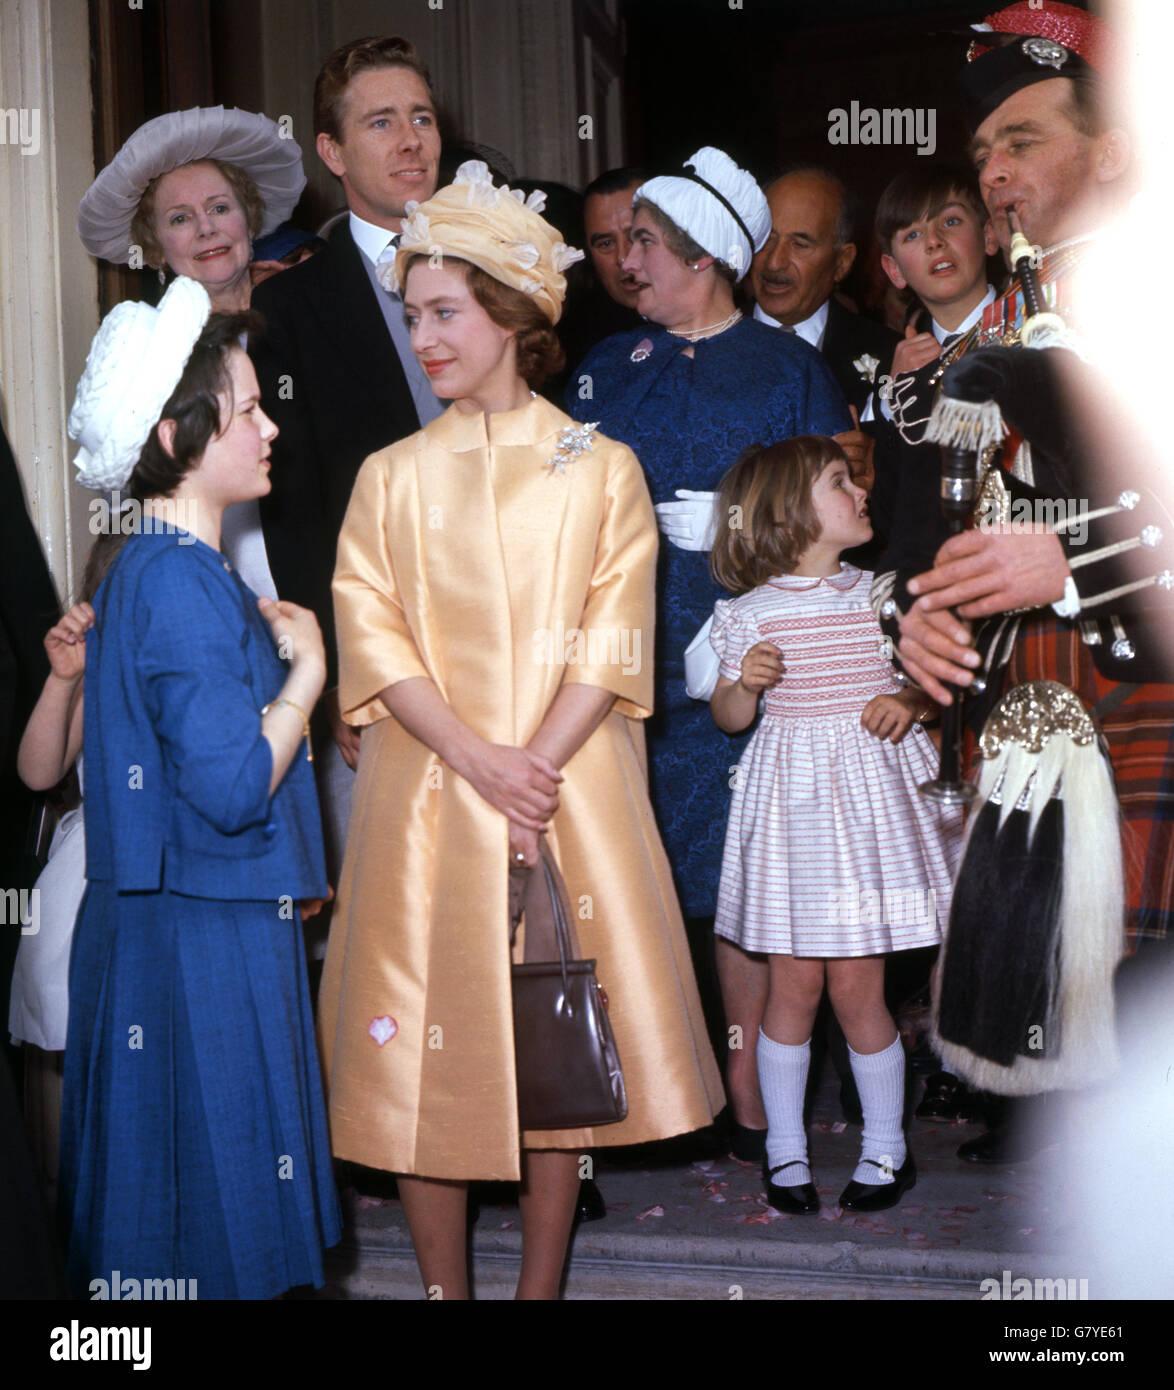 Princess Margaret Wedding High Resolution Stock Photography And